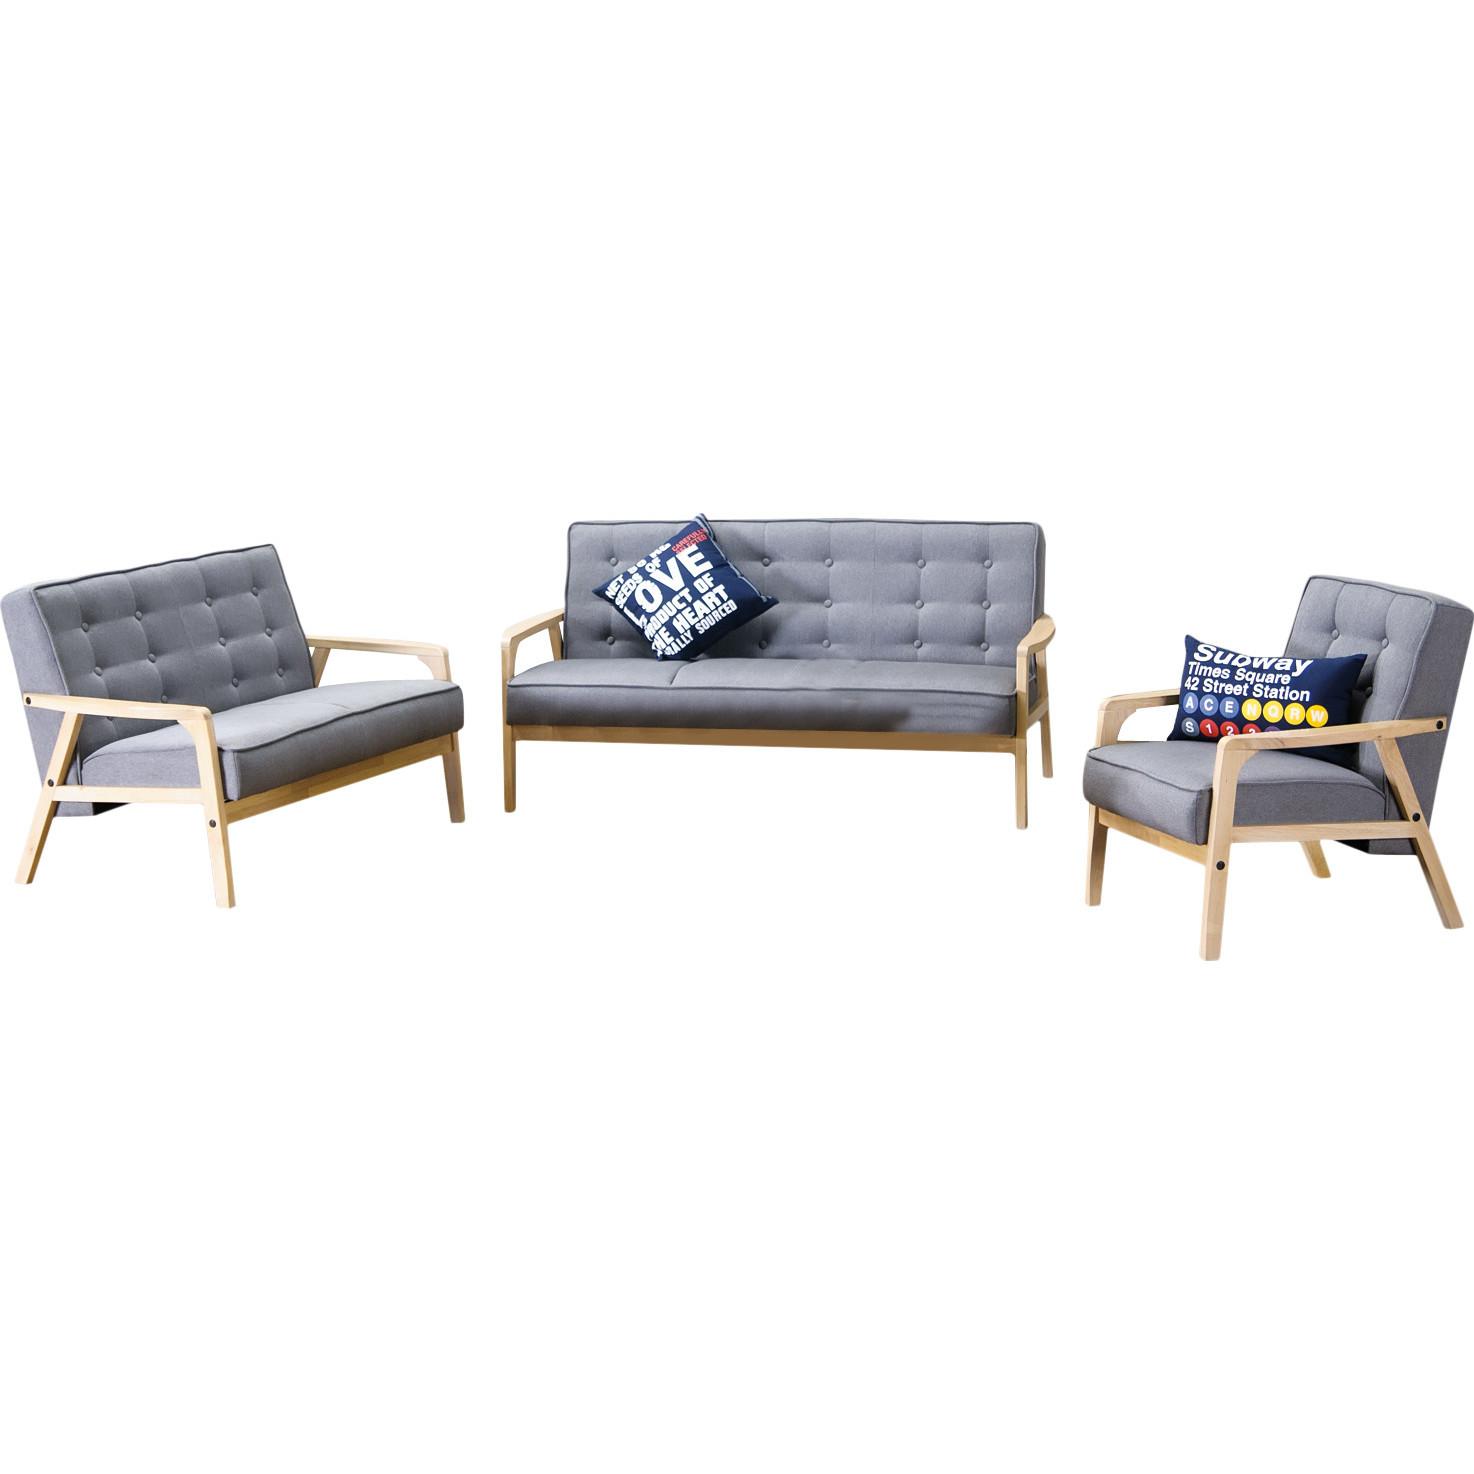 Baxton Studio Mid Century TIMOR 3PC Sofa Set Gray   BSOTIMOR 3PC Sofa Set  ...